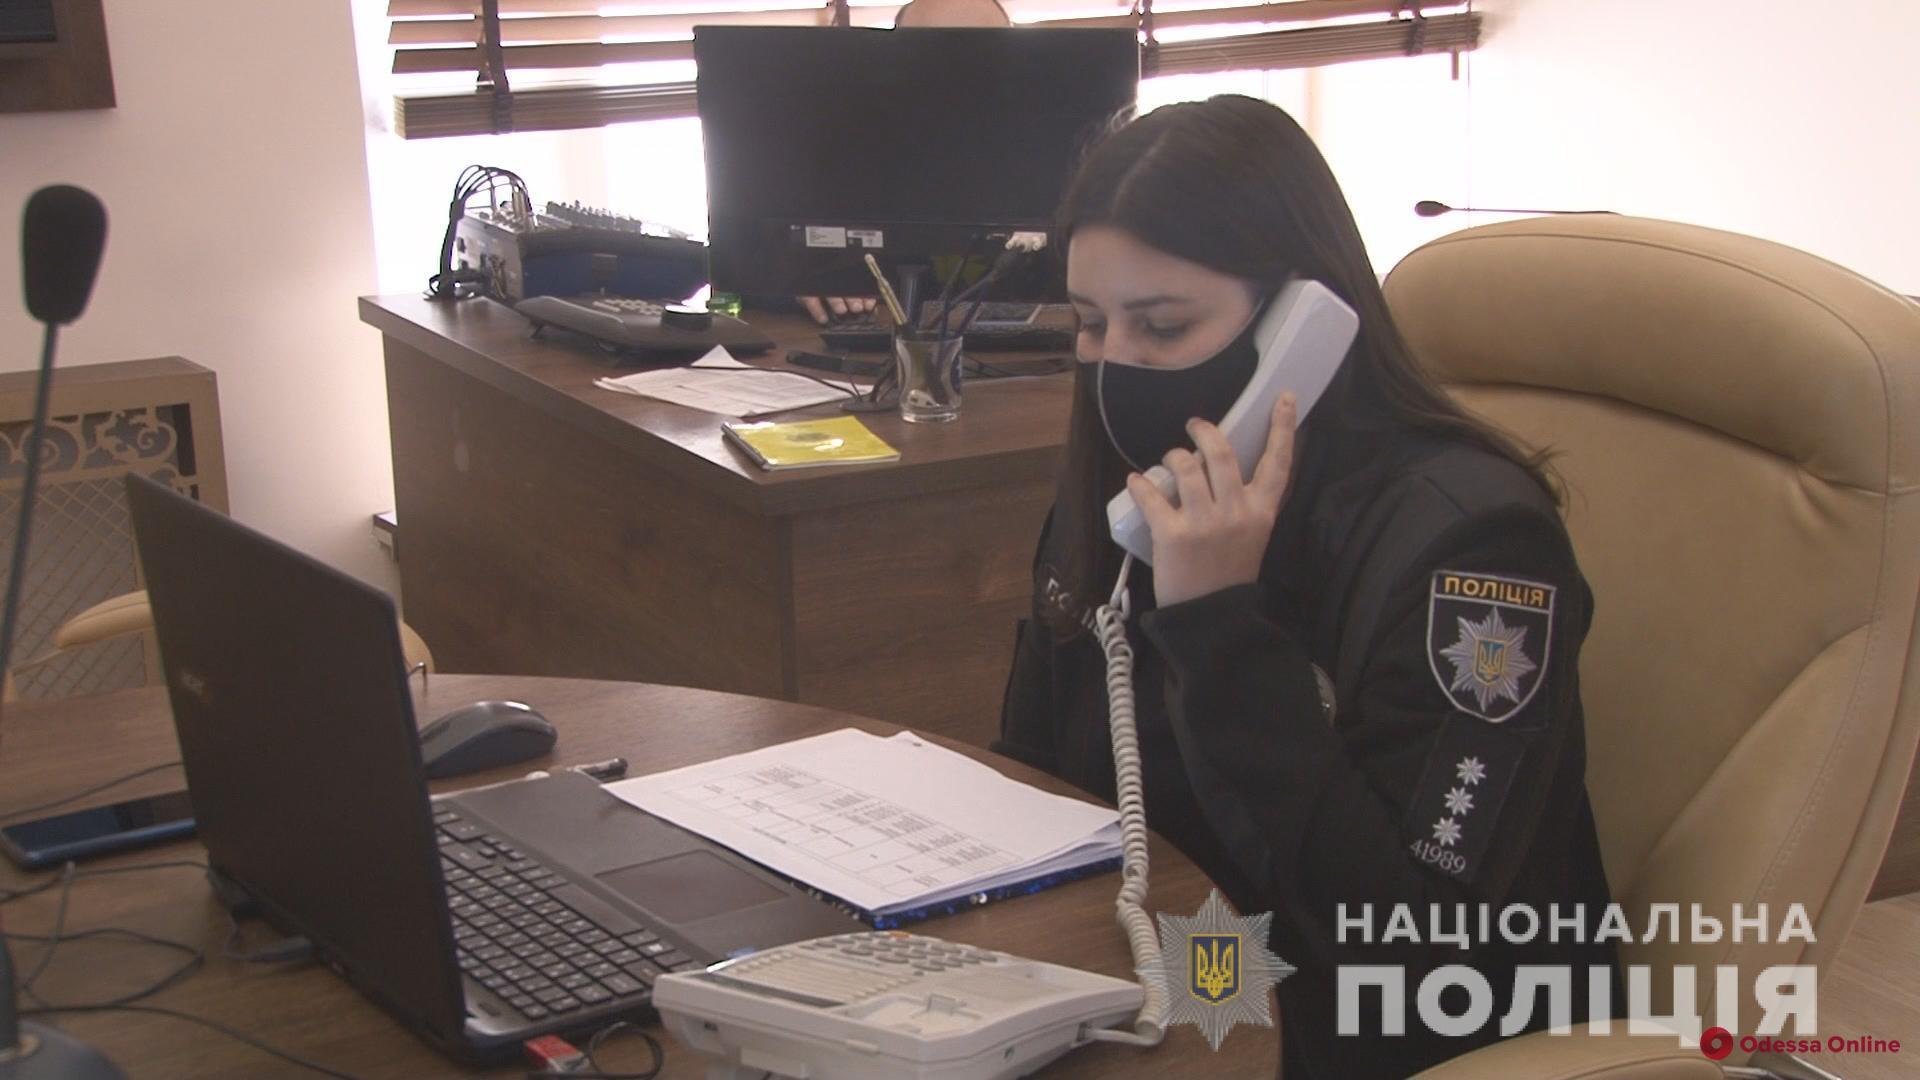 Одесские правоохранители составили свыше 200 админпротоколов за нарушение режима карантина